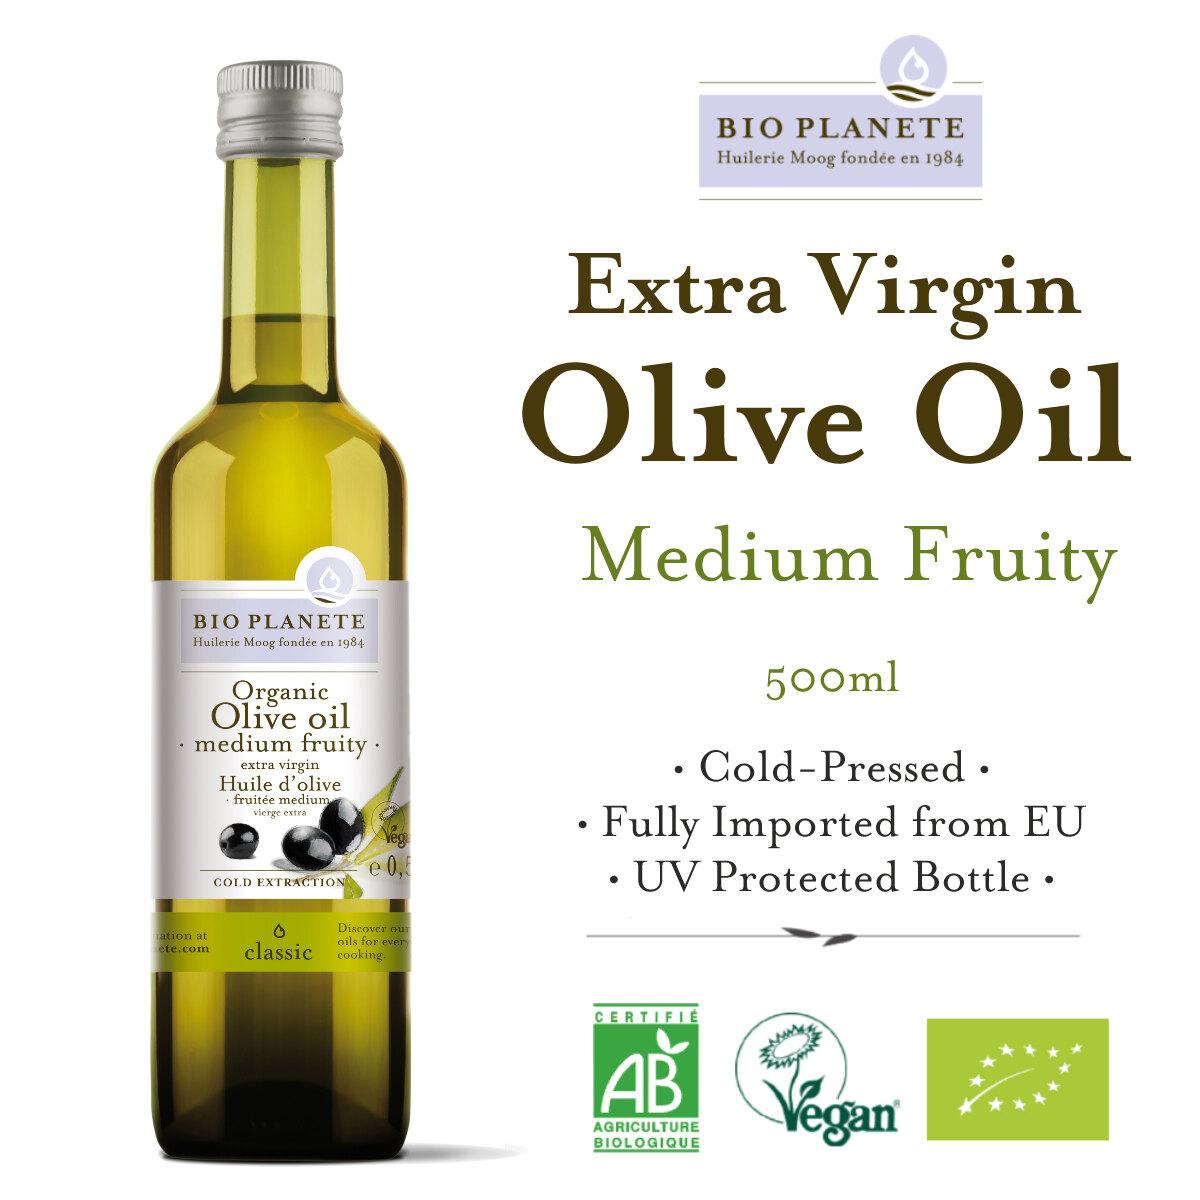 BIO PLANETE Organic Extra Virgin Olive Oil (500ml) - Organik Minyak Zaitun Eropah - Bio Planete 有机橄榄油 (500毫升)